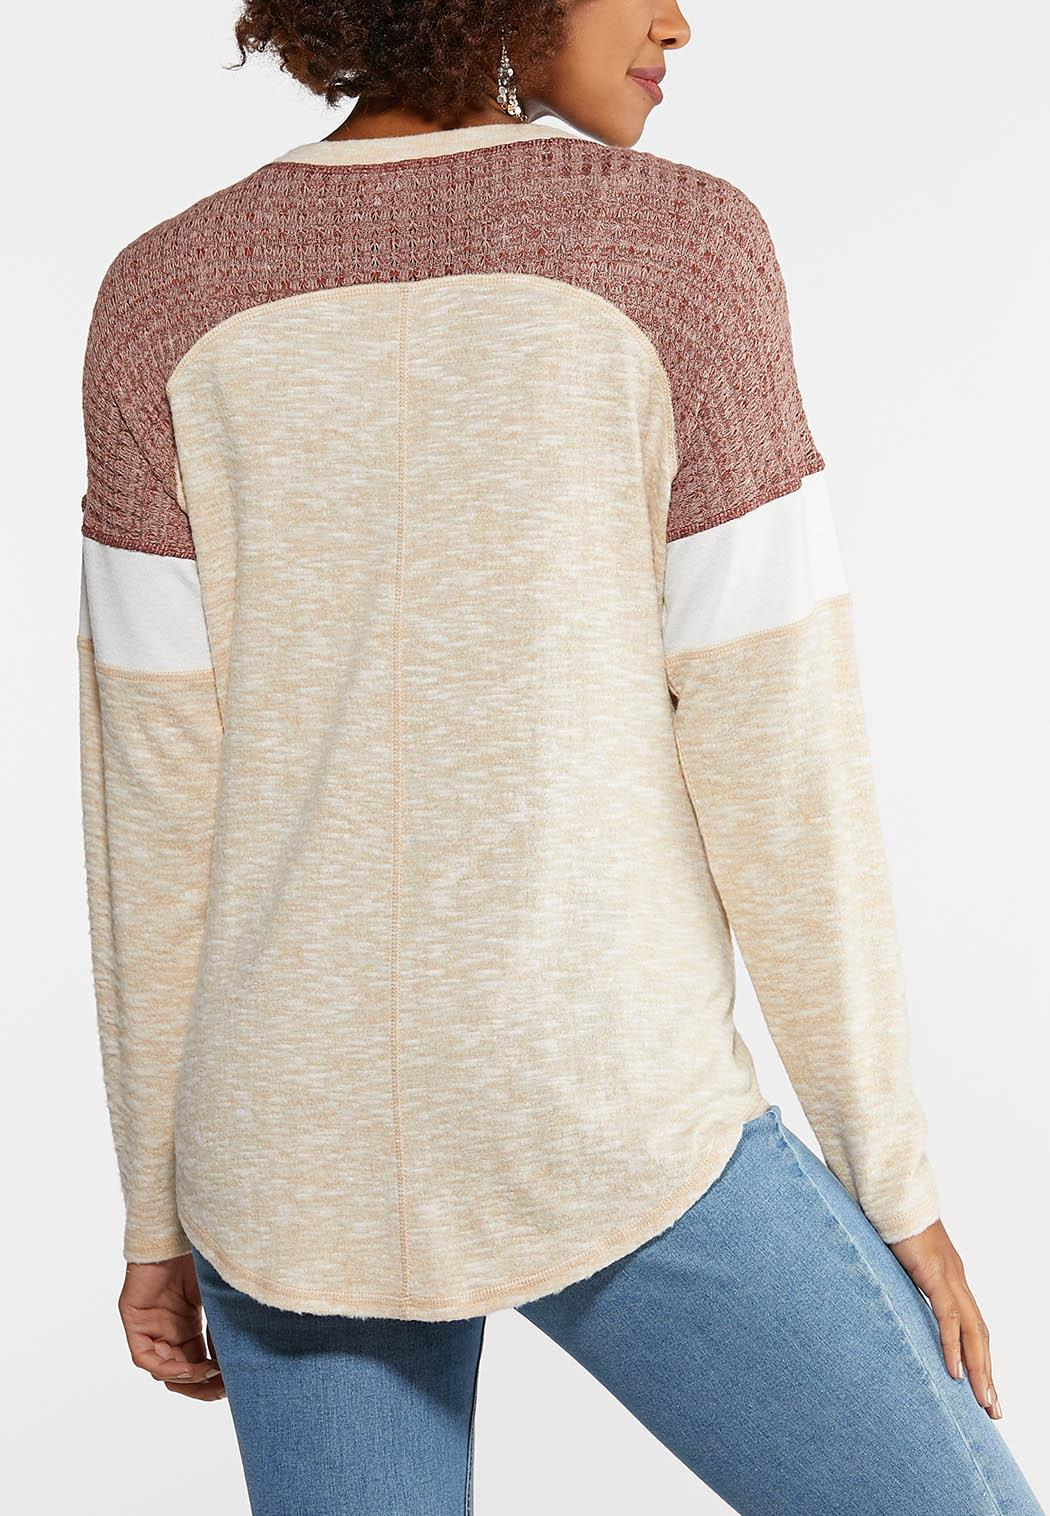 Plus Size Llamaste Thermal Top (Item #44027078)